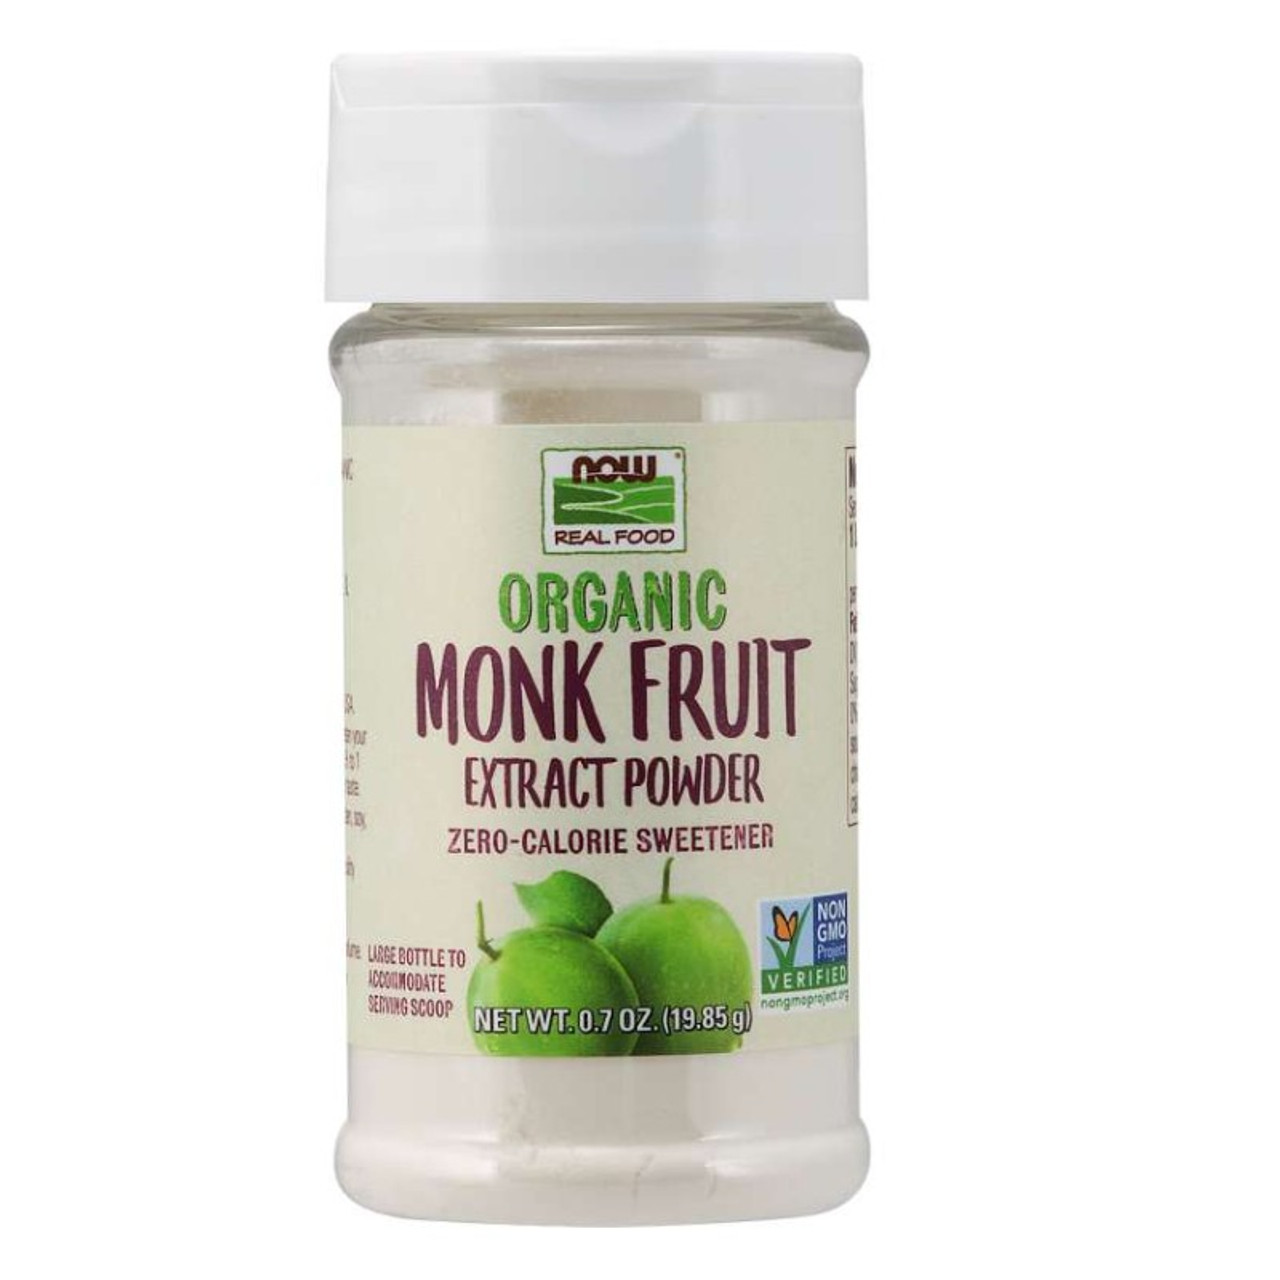 Now Organic Monk Fruit Extract Powder